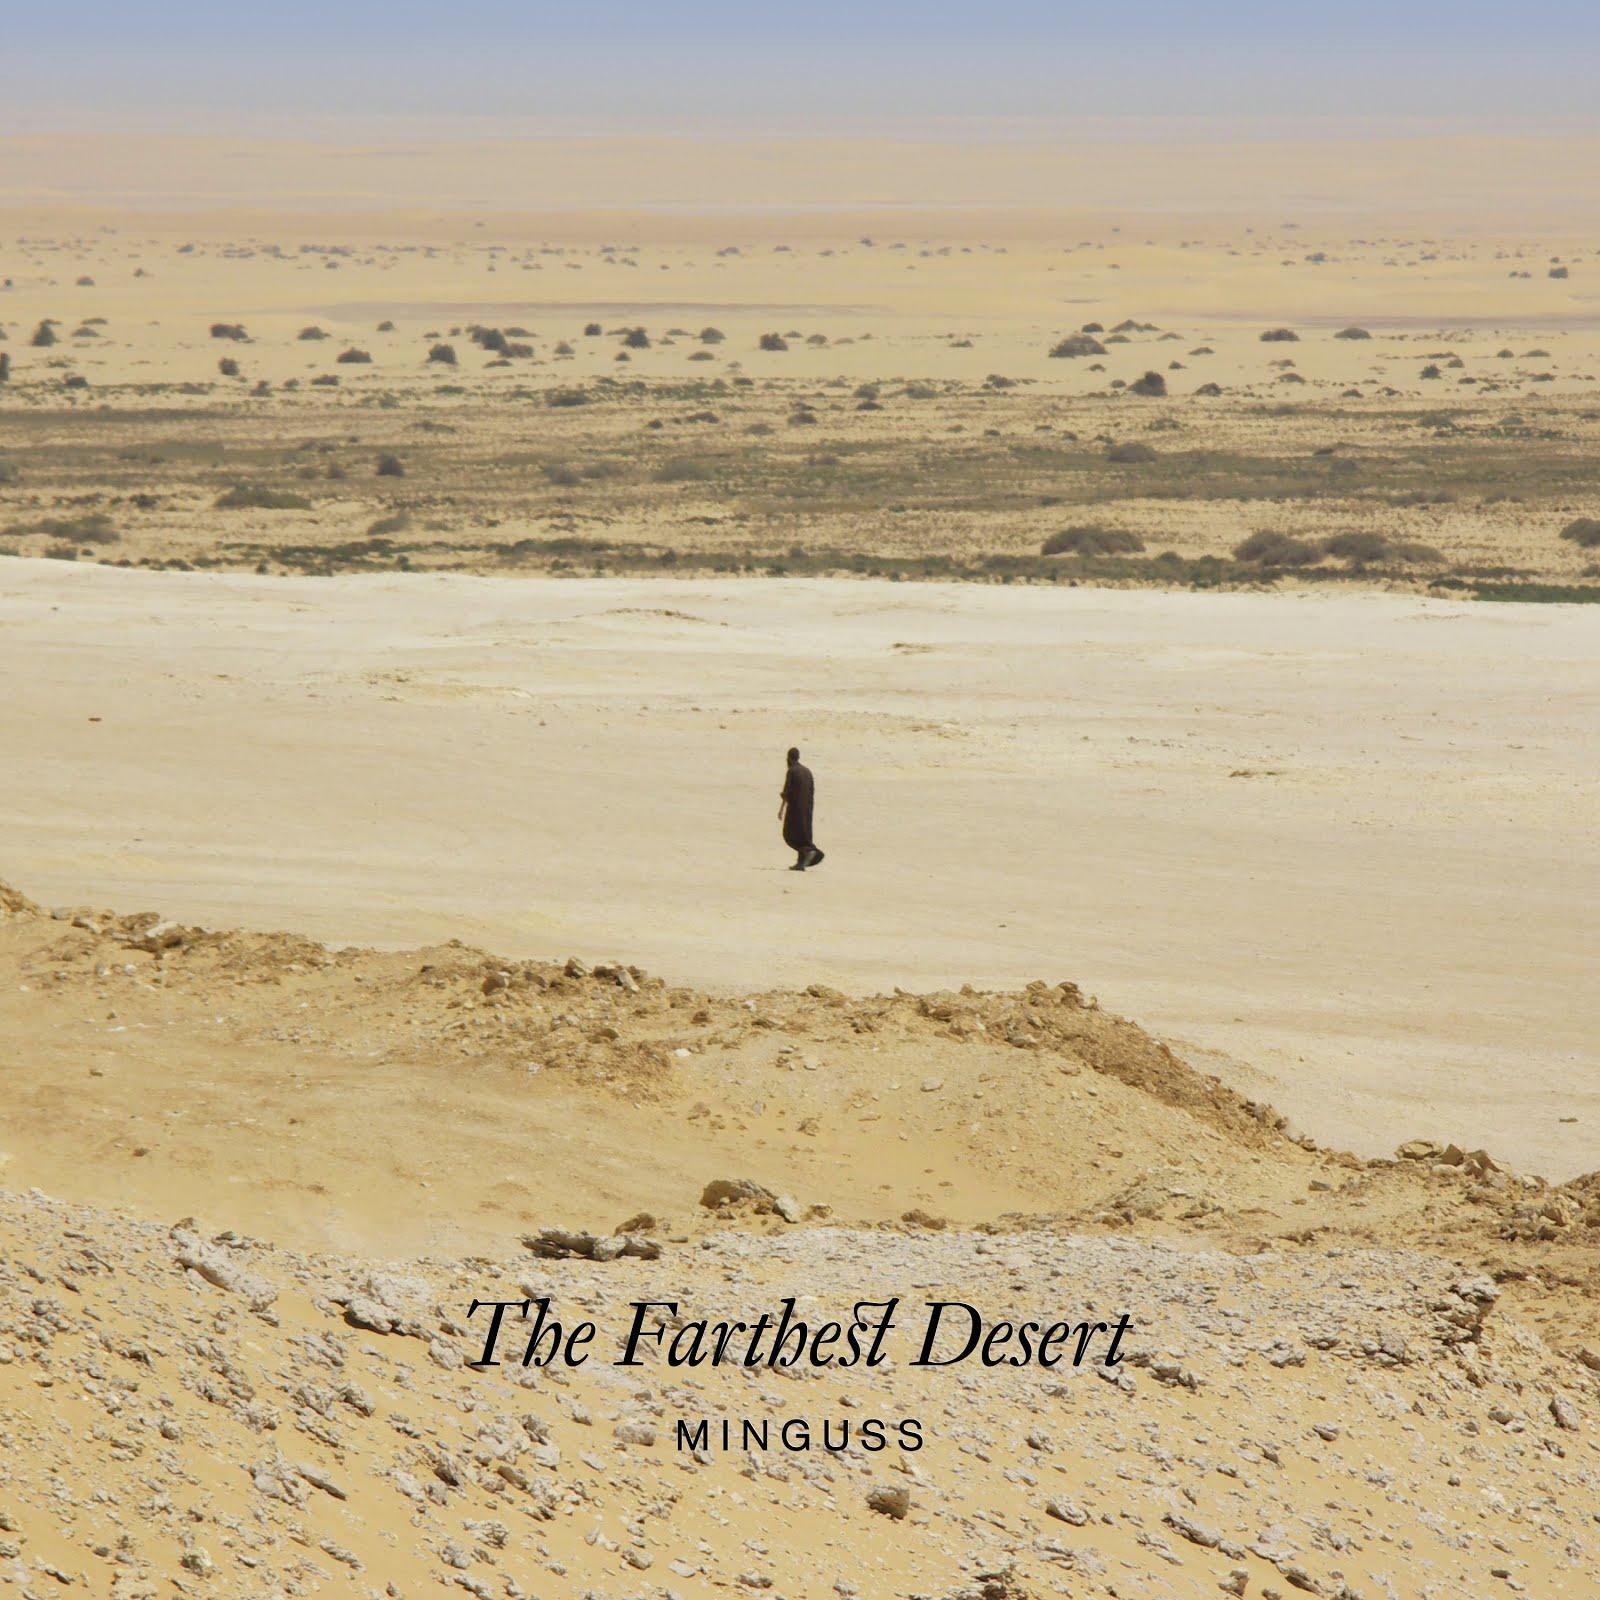 The Farthest Desert